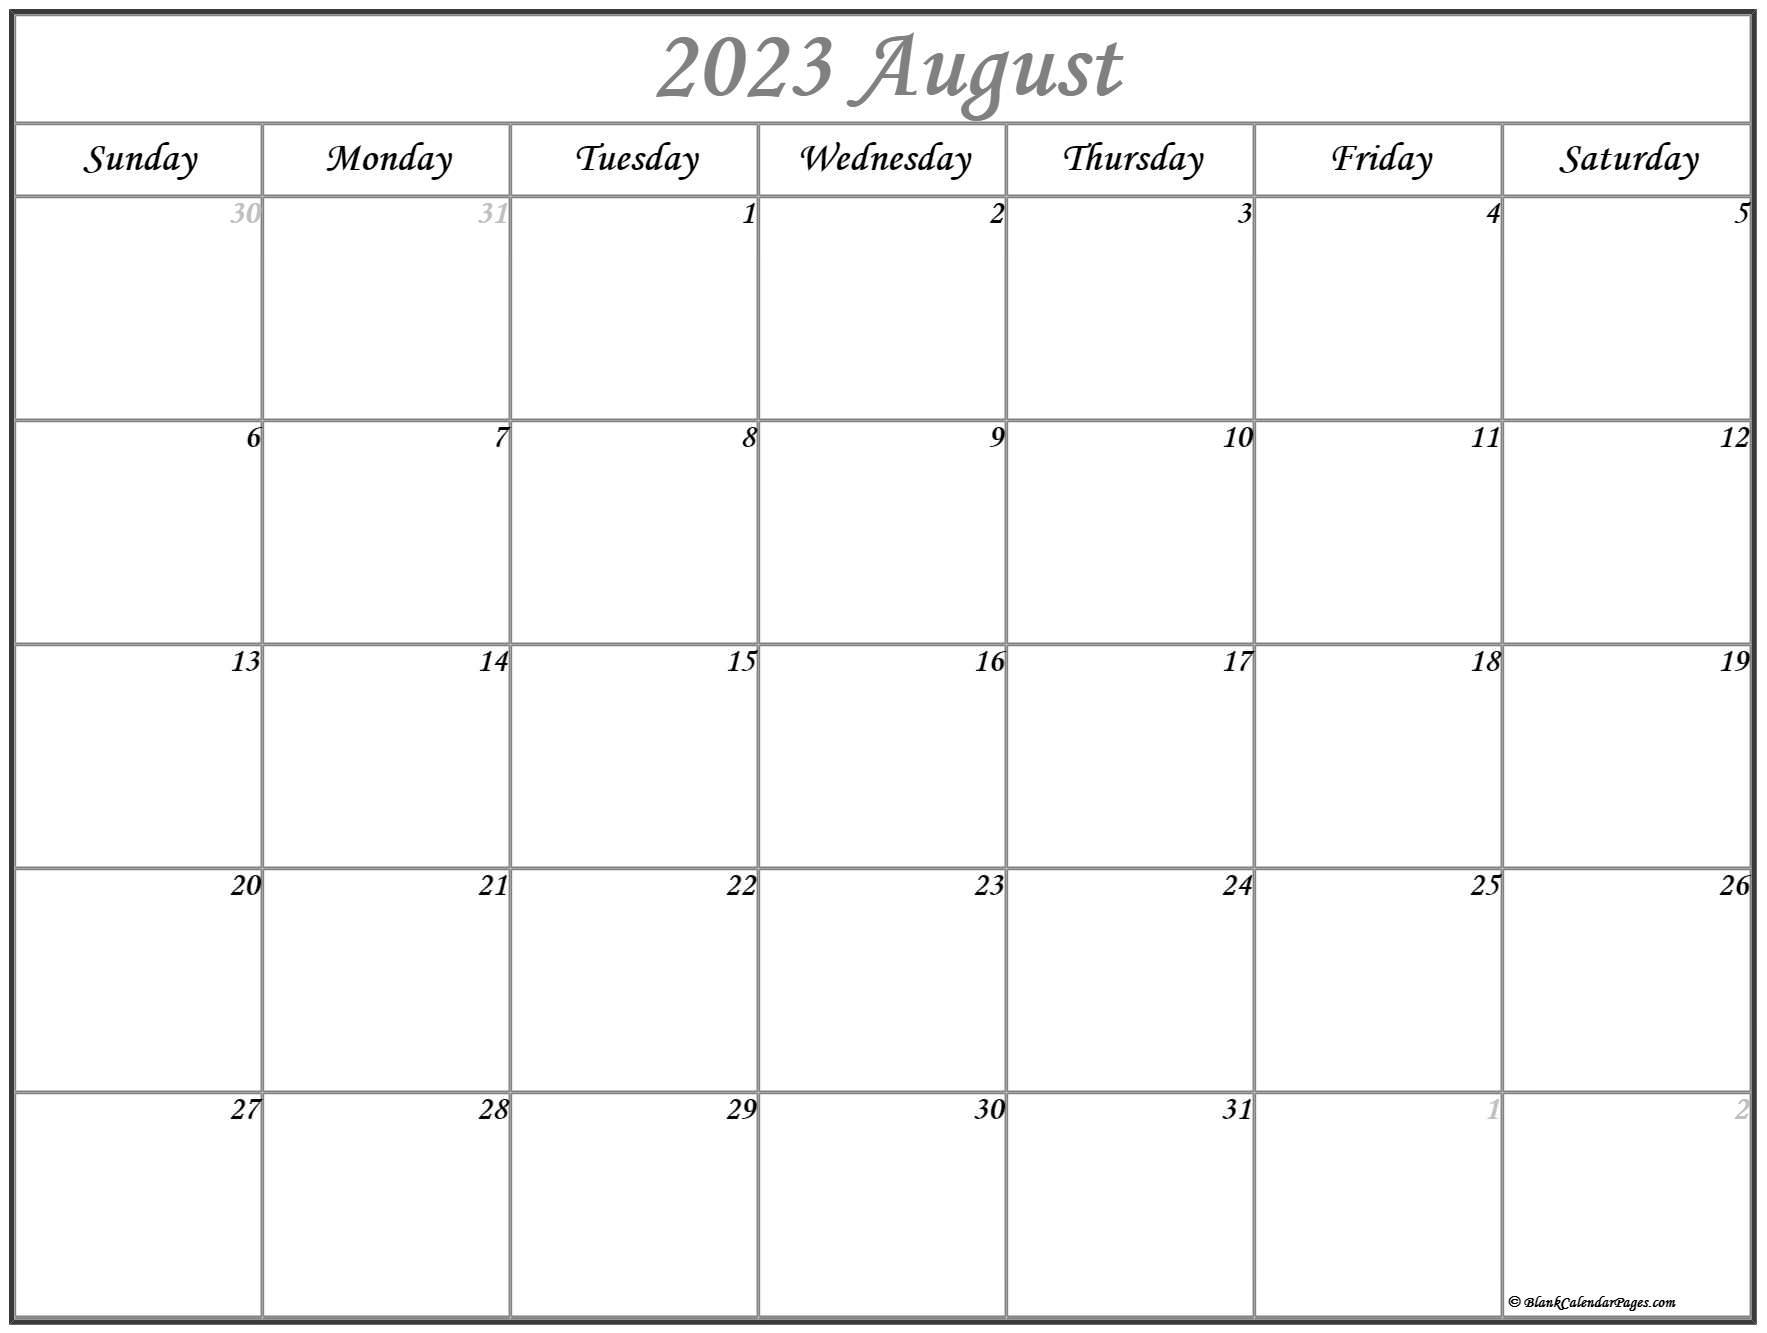 August 2022 calendar | free printable calendar